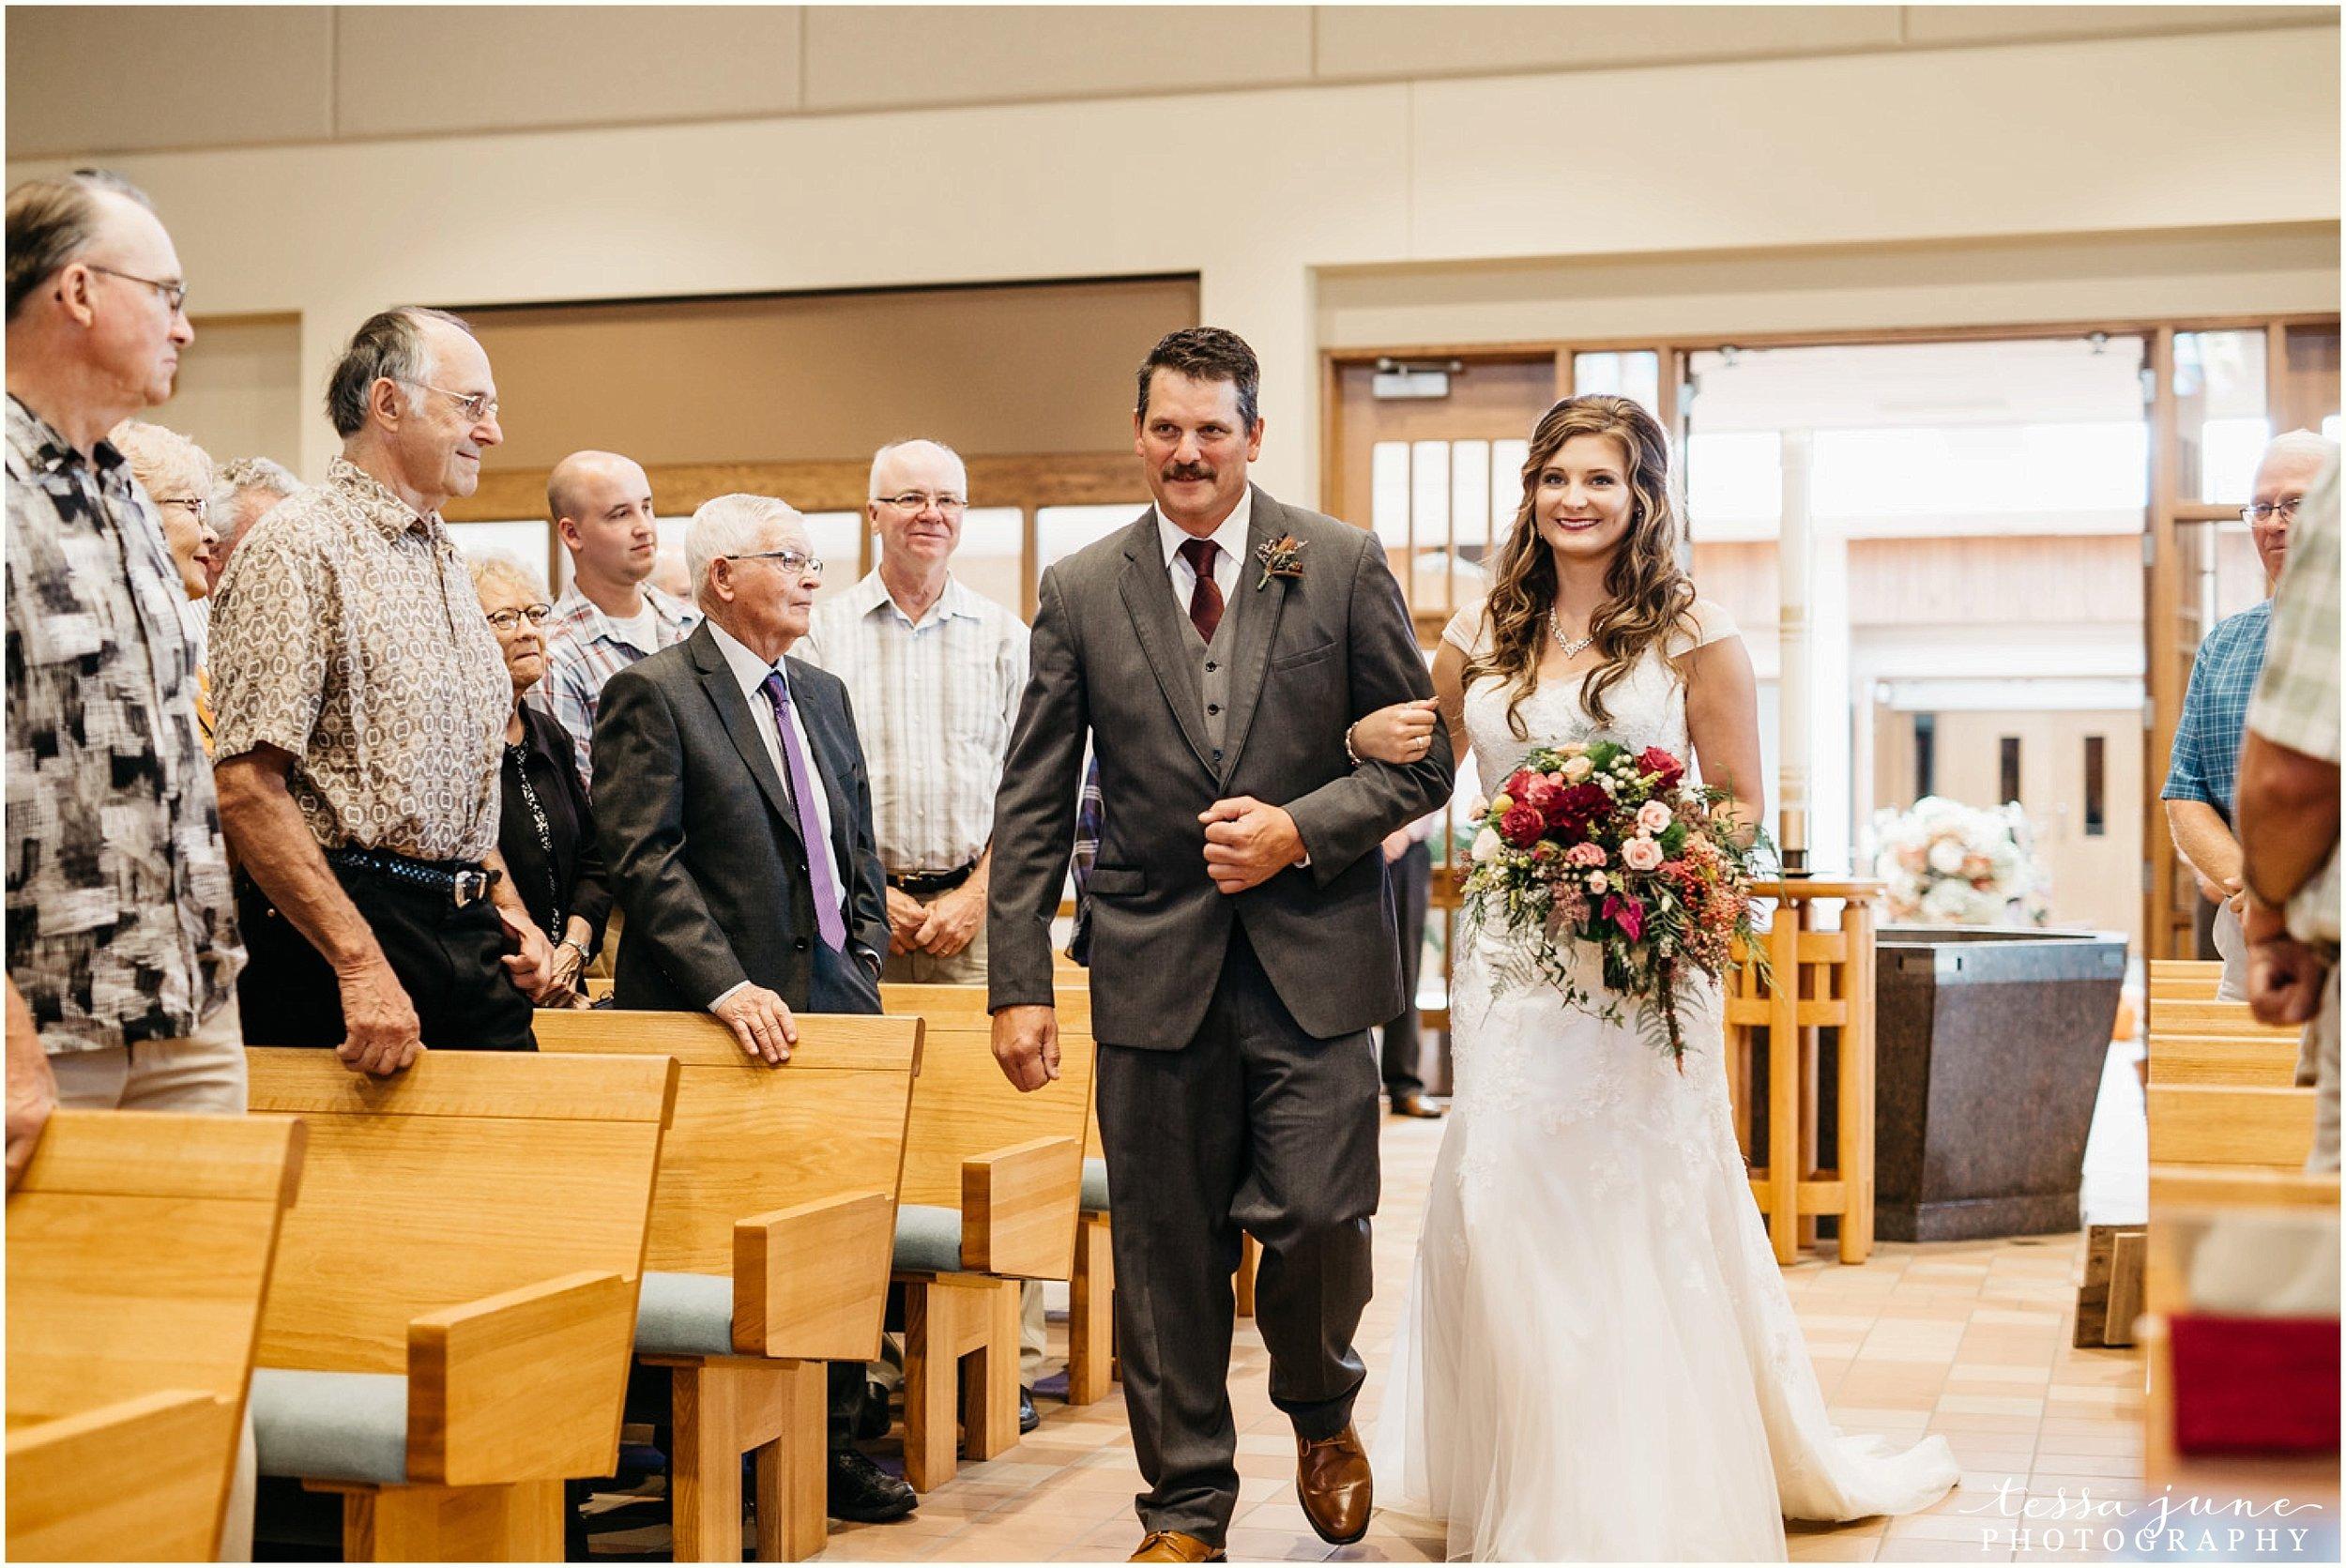 bohemian-minnesota-wedding-mismatched-bridesmaid-dresses-waterfall-st-cloud-tessa-june-photography-103.jpg